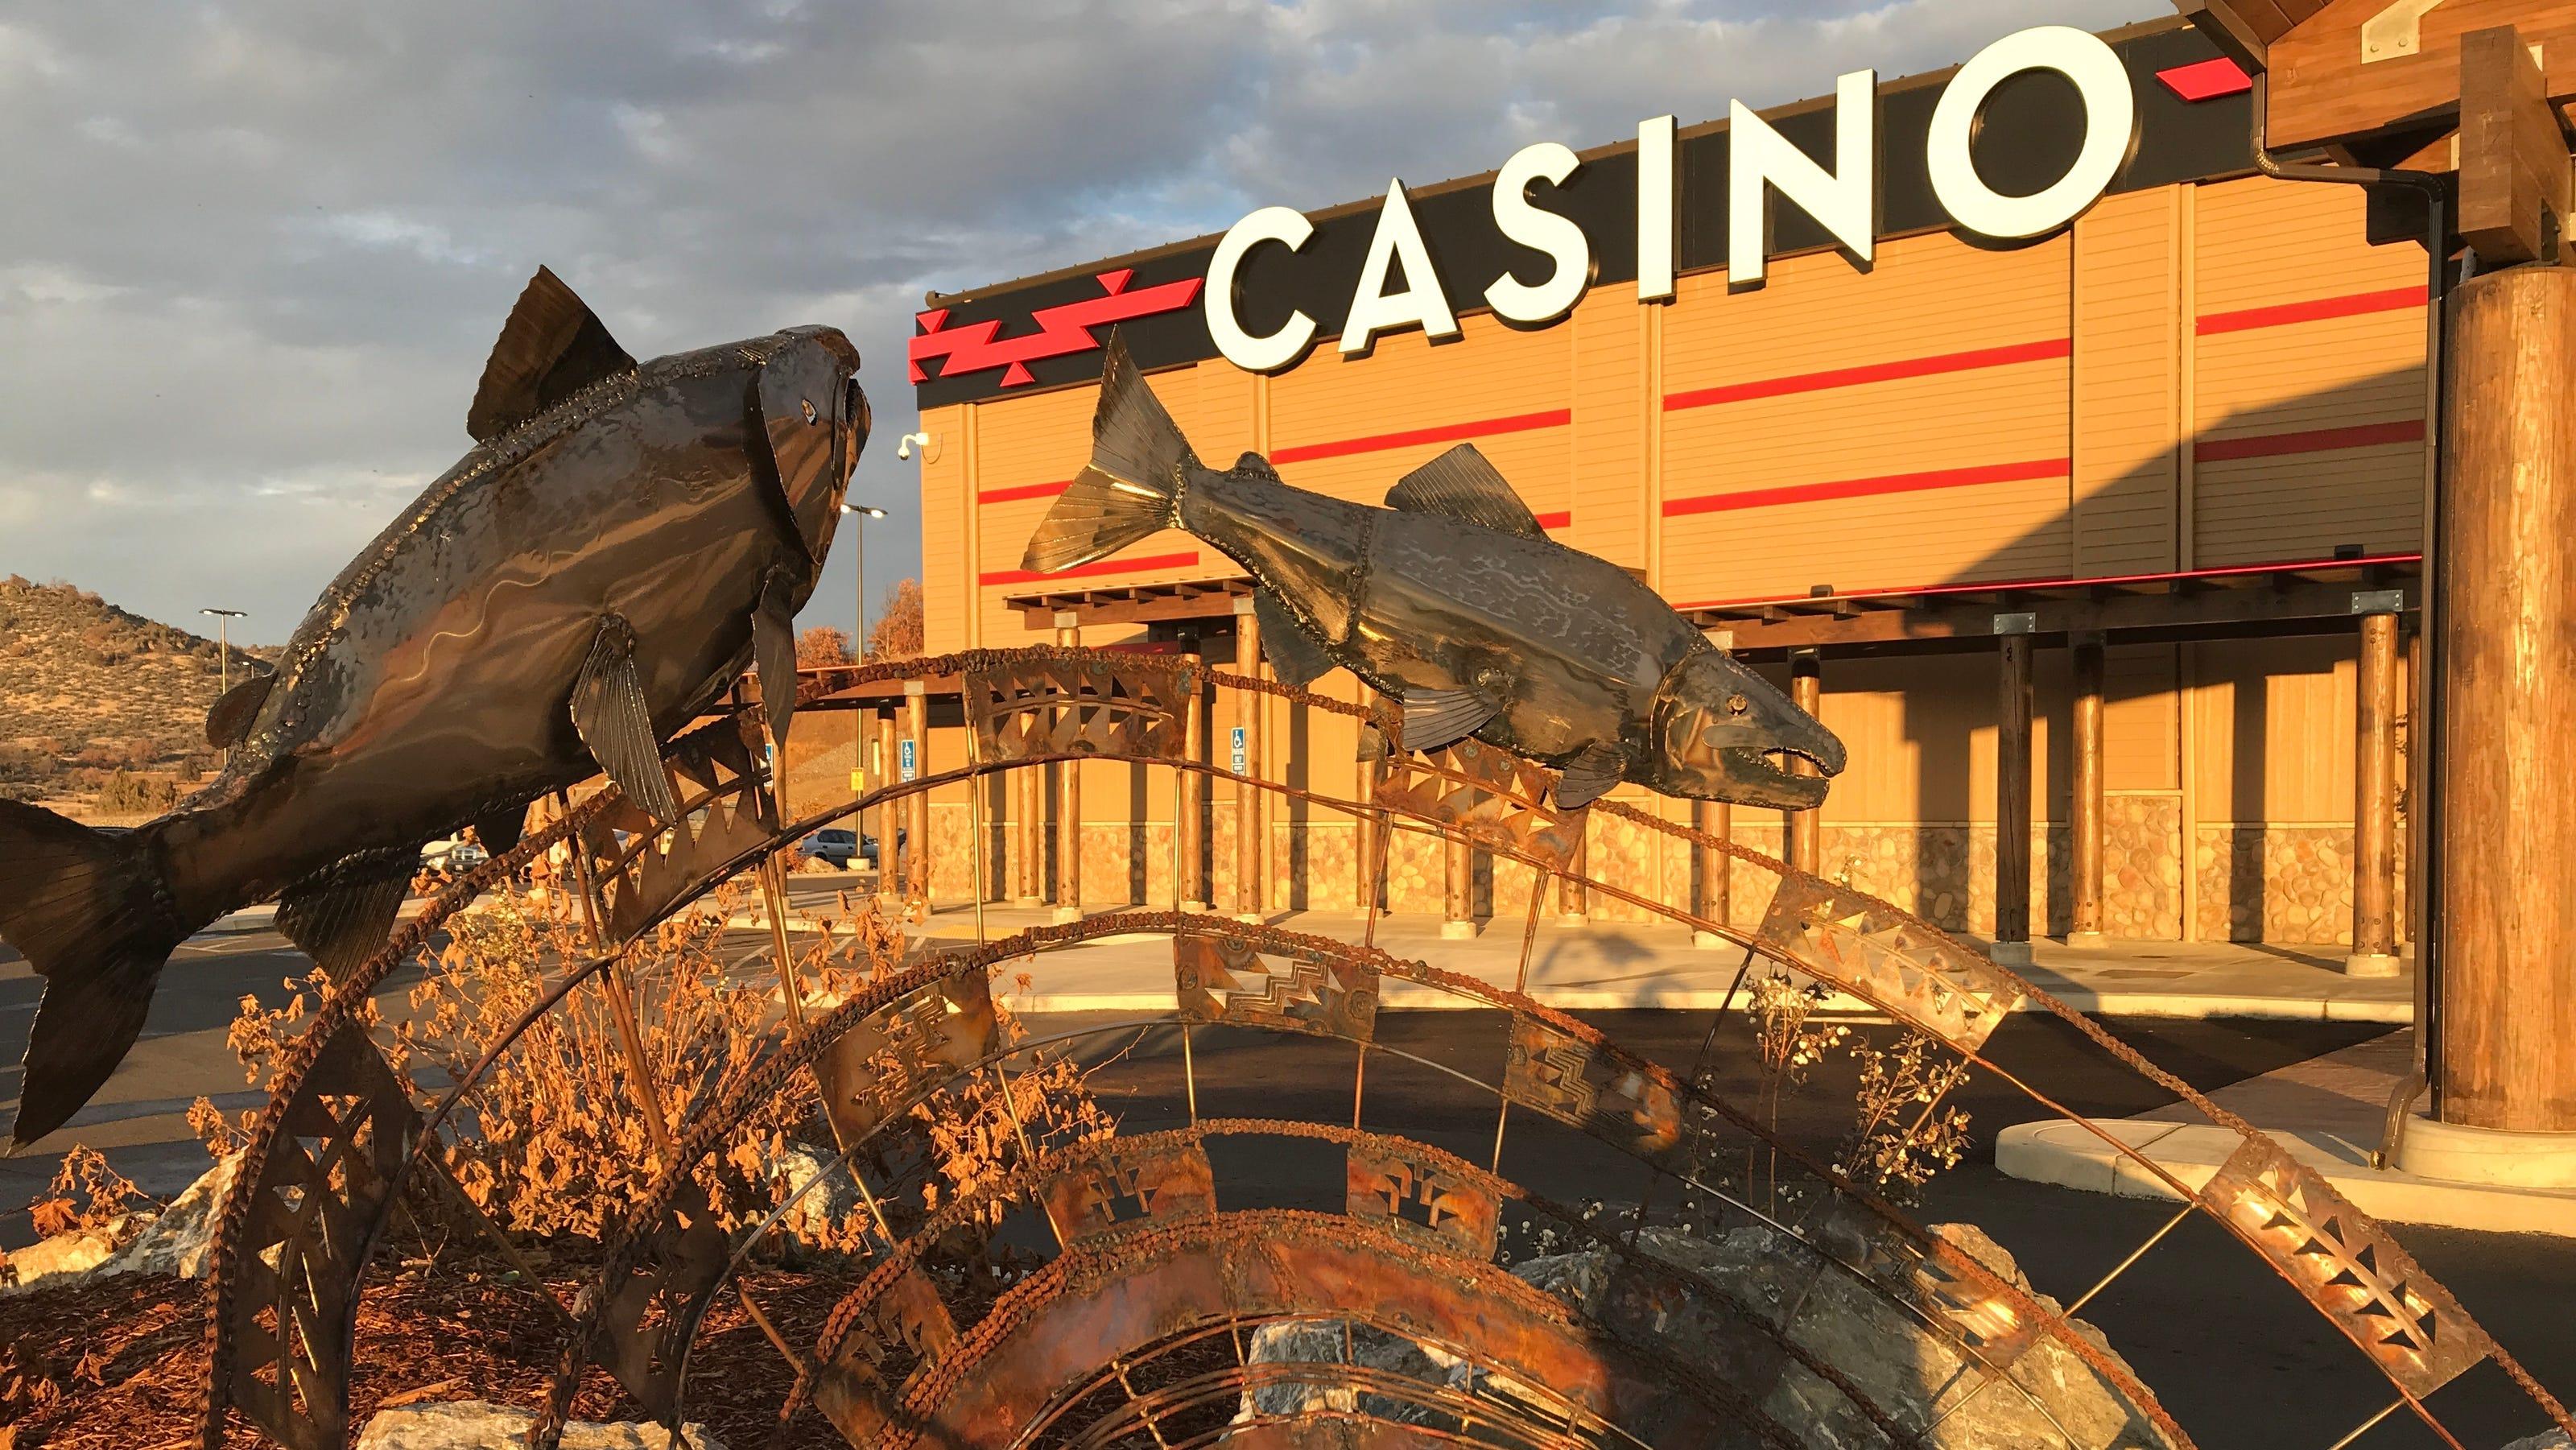 Yreka casino battlefront 2 full game download